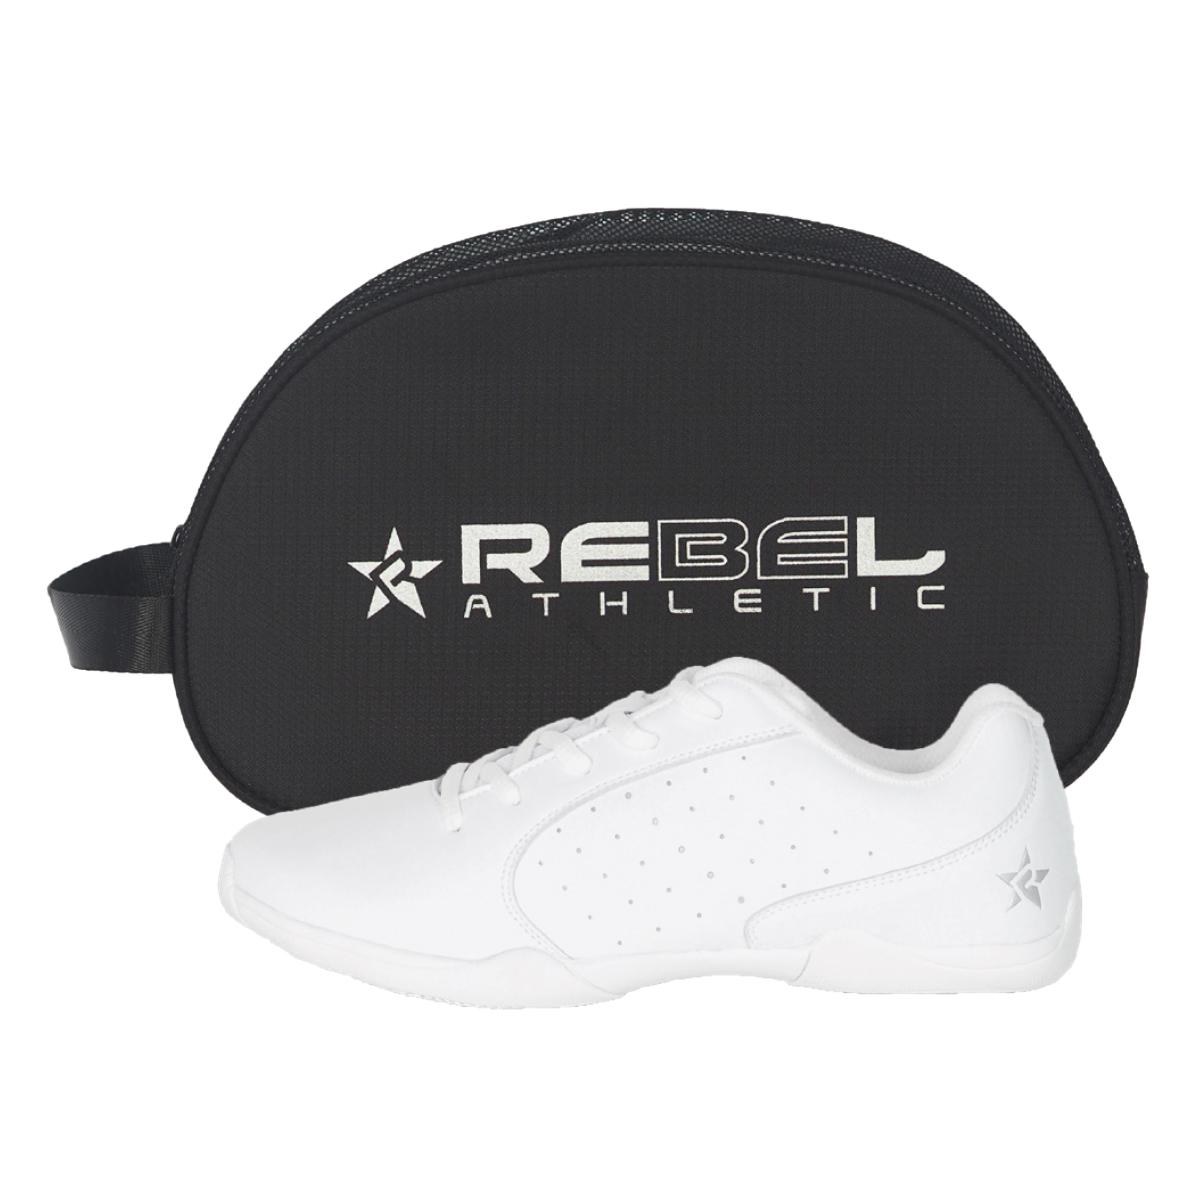 Rebel Rise Cheer Shoe | High-quality